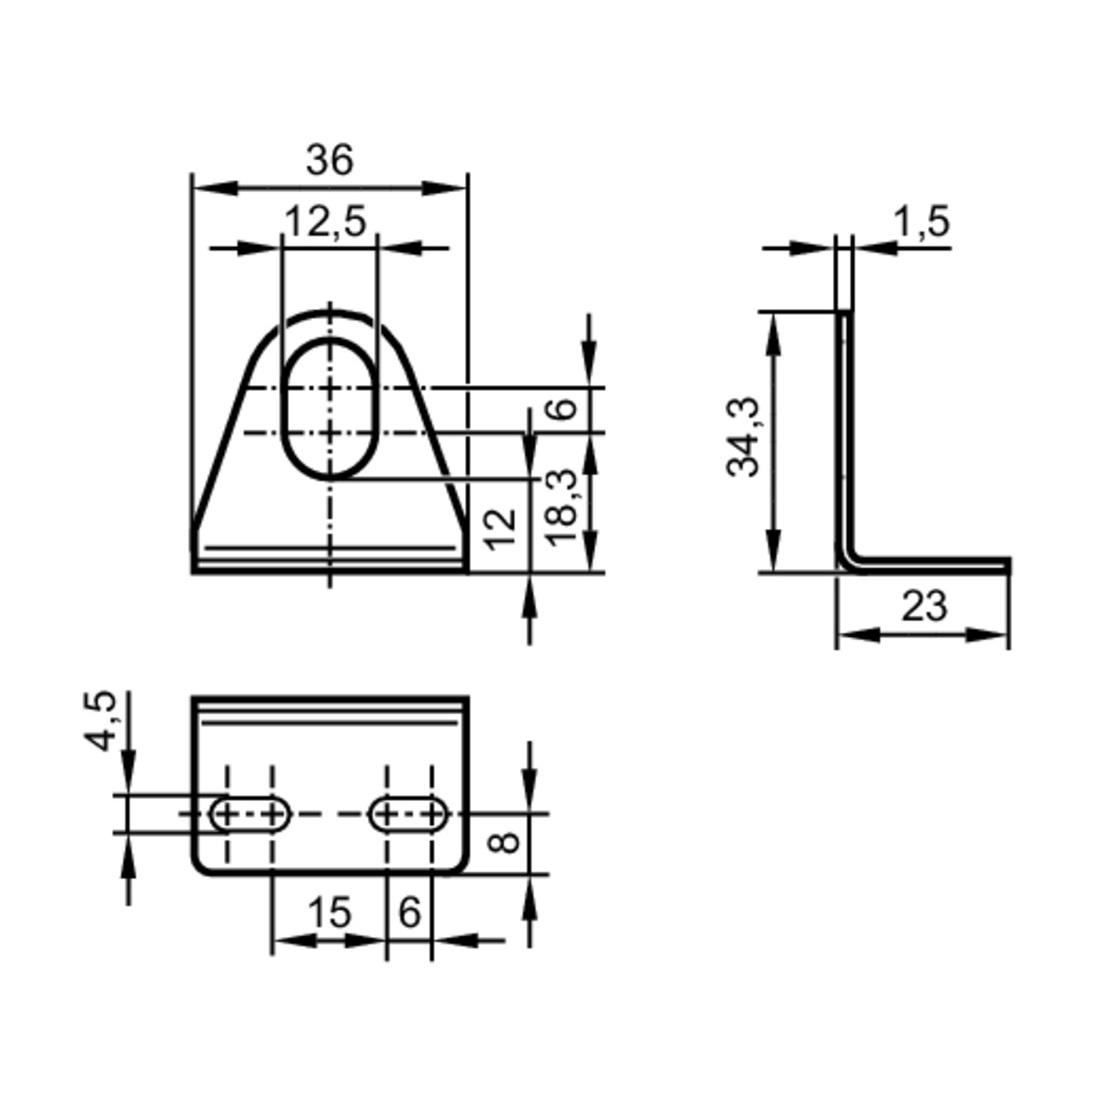 56122 angle bracket for m12 sensors e12488 2d dimensions